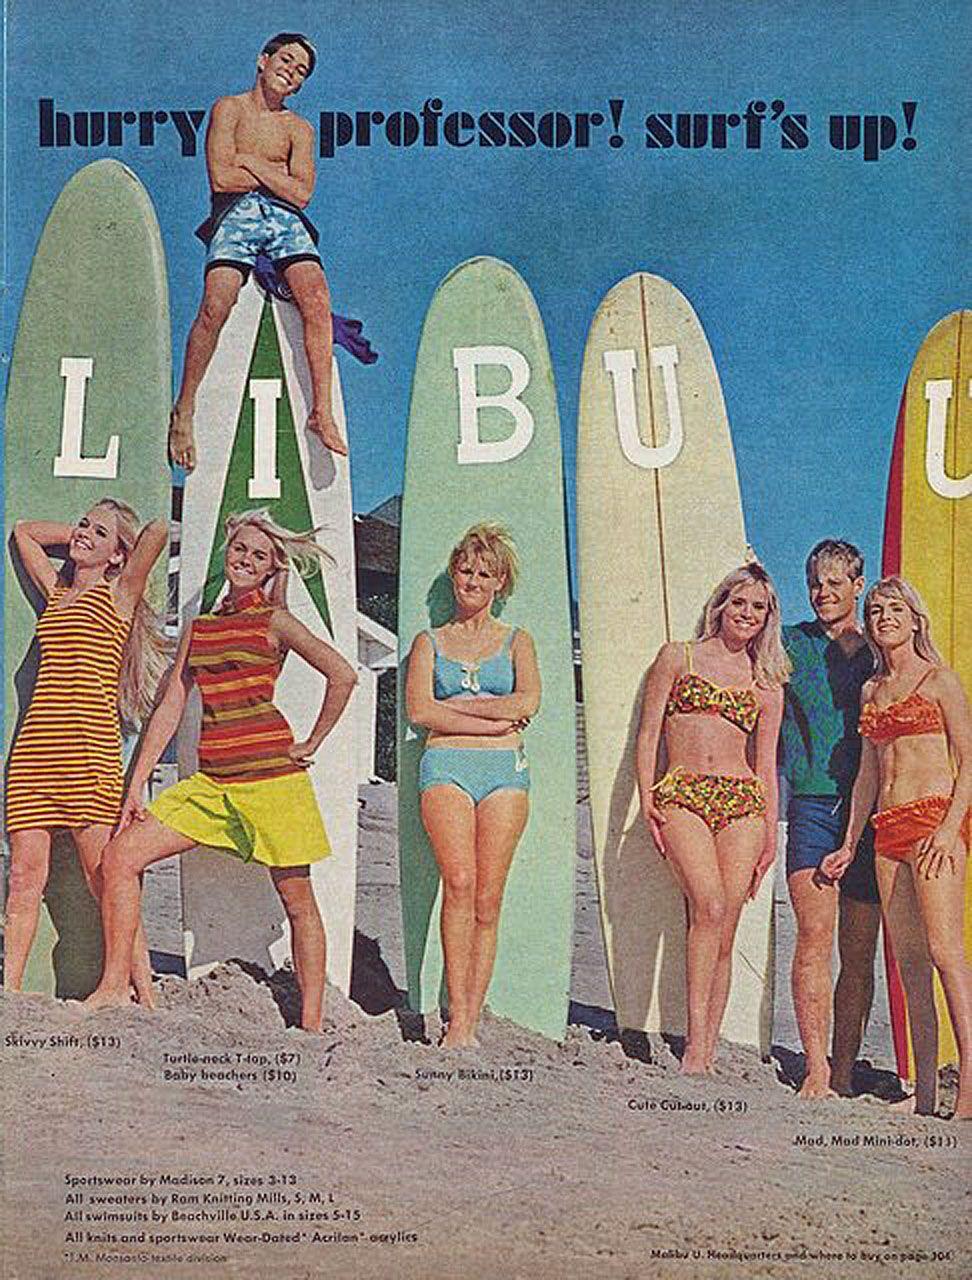 1966527e25 Old Surf clothes ad. | SURF | Surf outfit, Malibu surf, Vintage surf